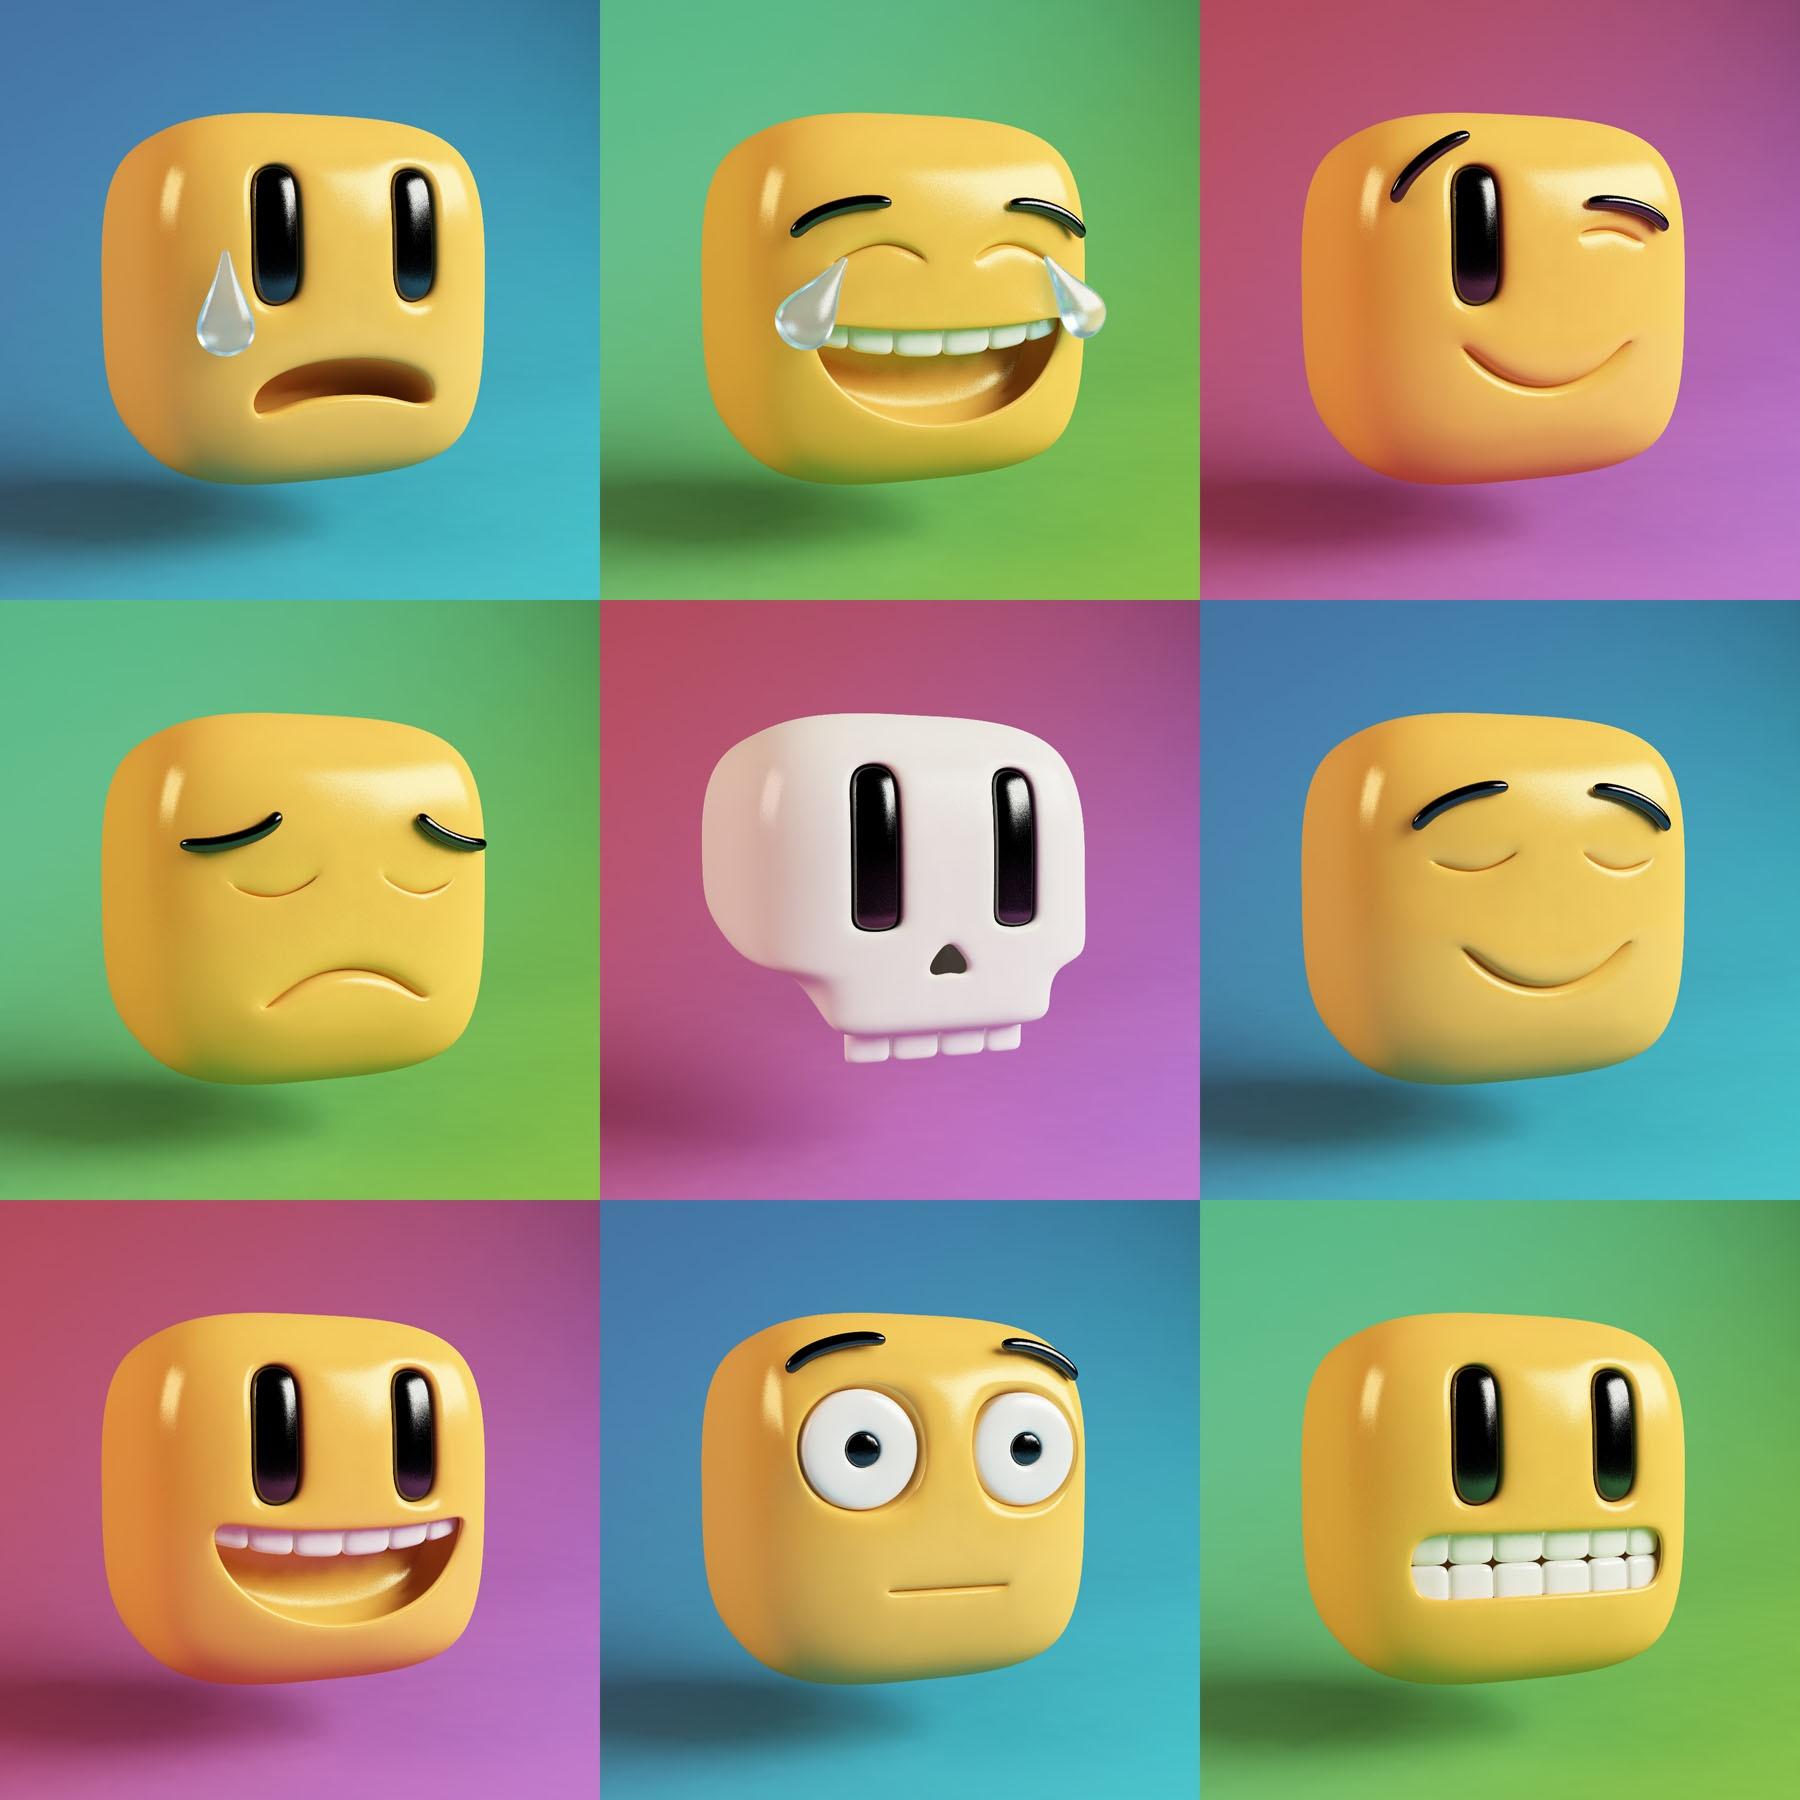 Conceptual illustration of emojis.